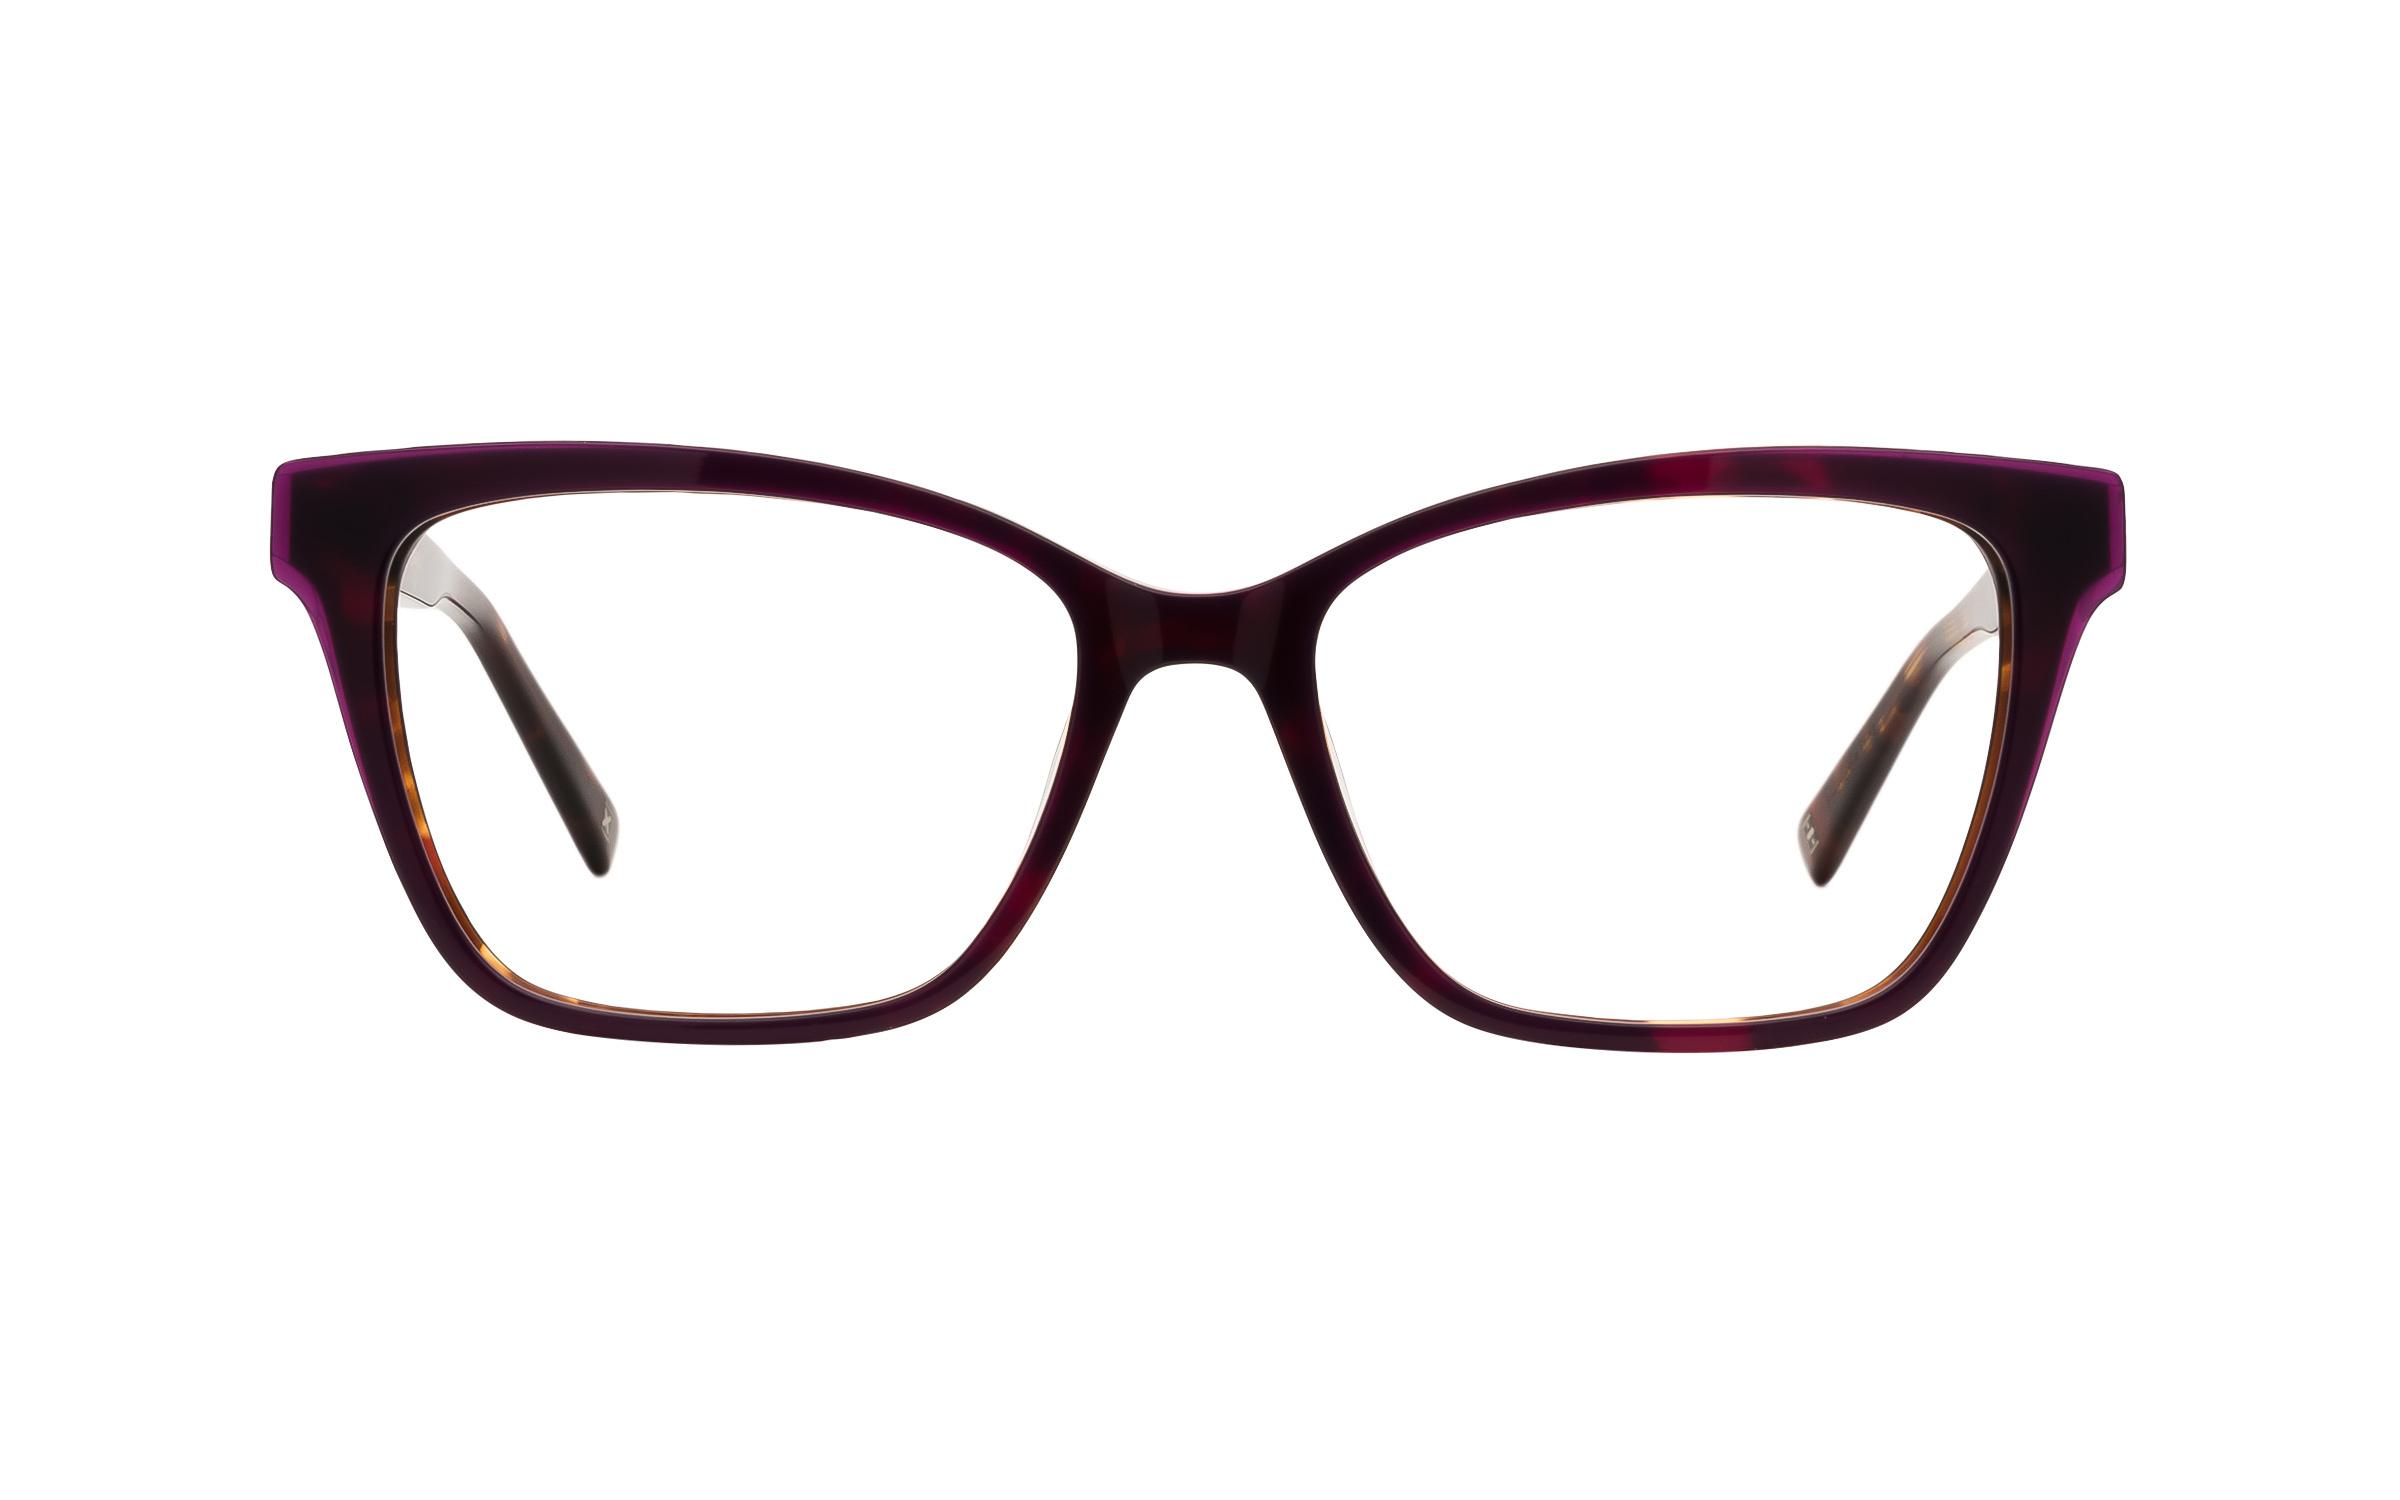 Derek_Cardigan_Womens_Glasses_DFrame_PurpleTortoise_Acetate_Online_Coastal